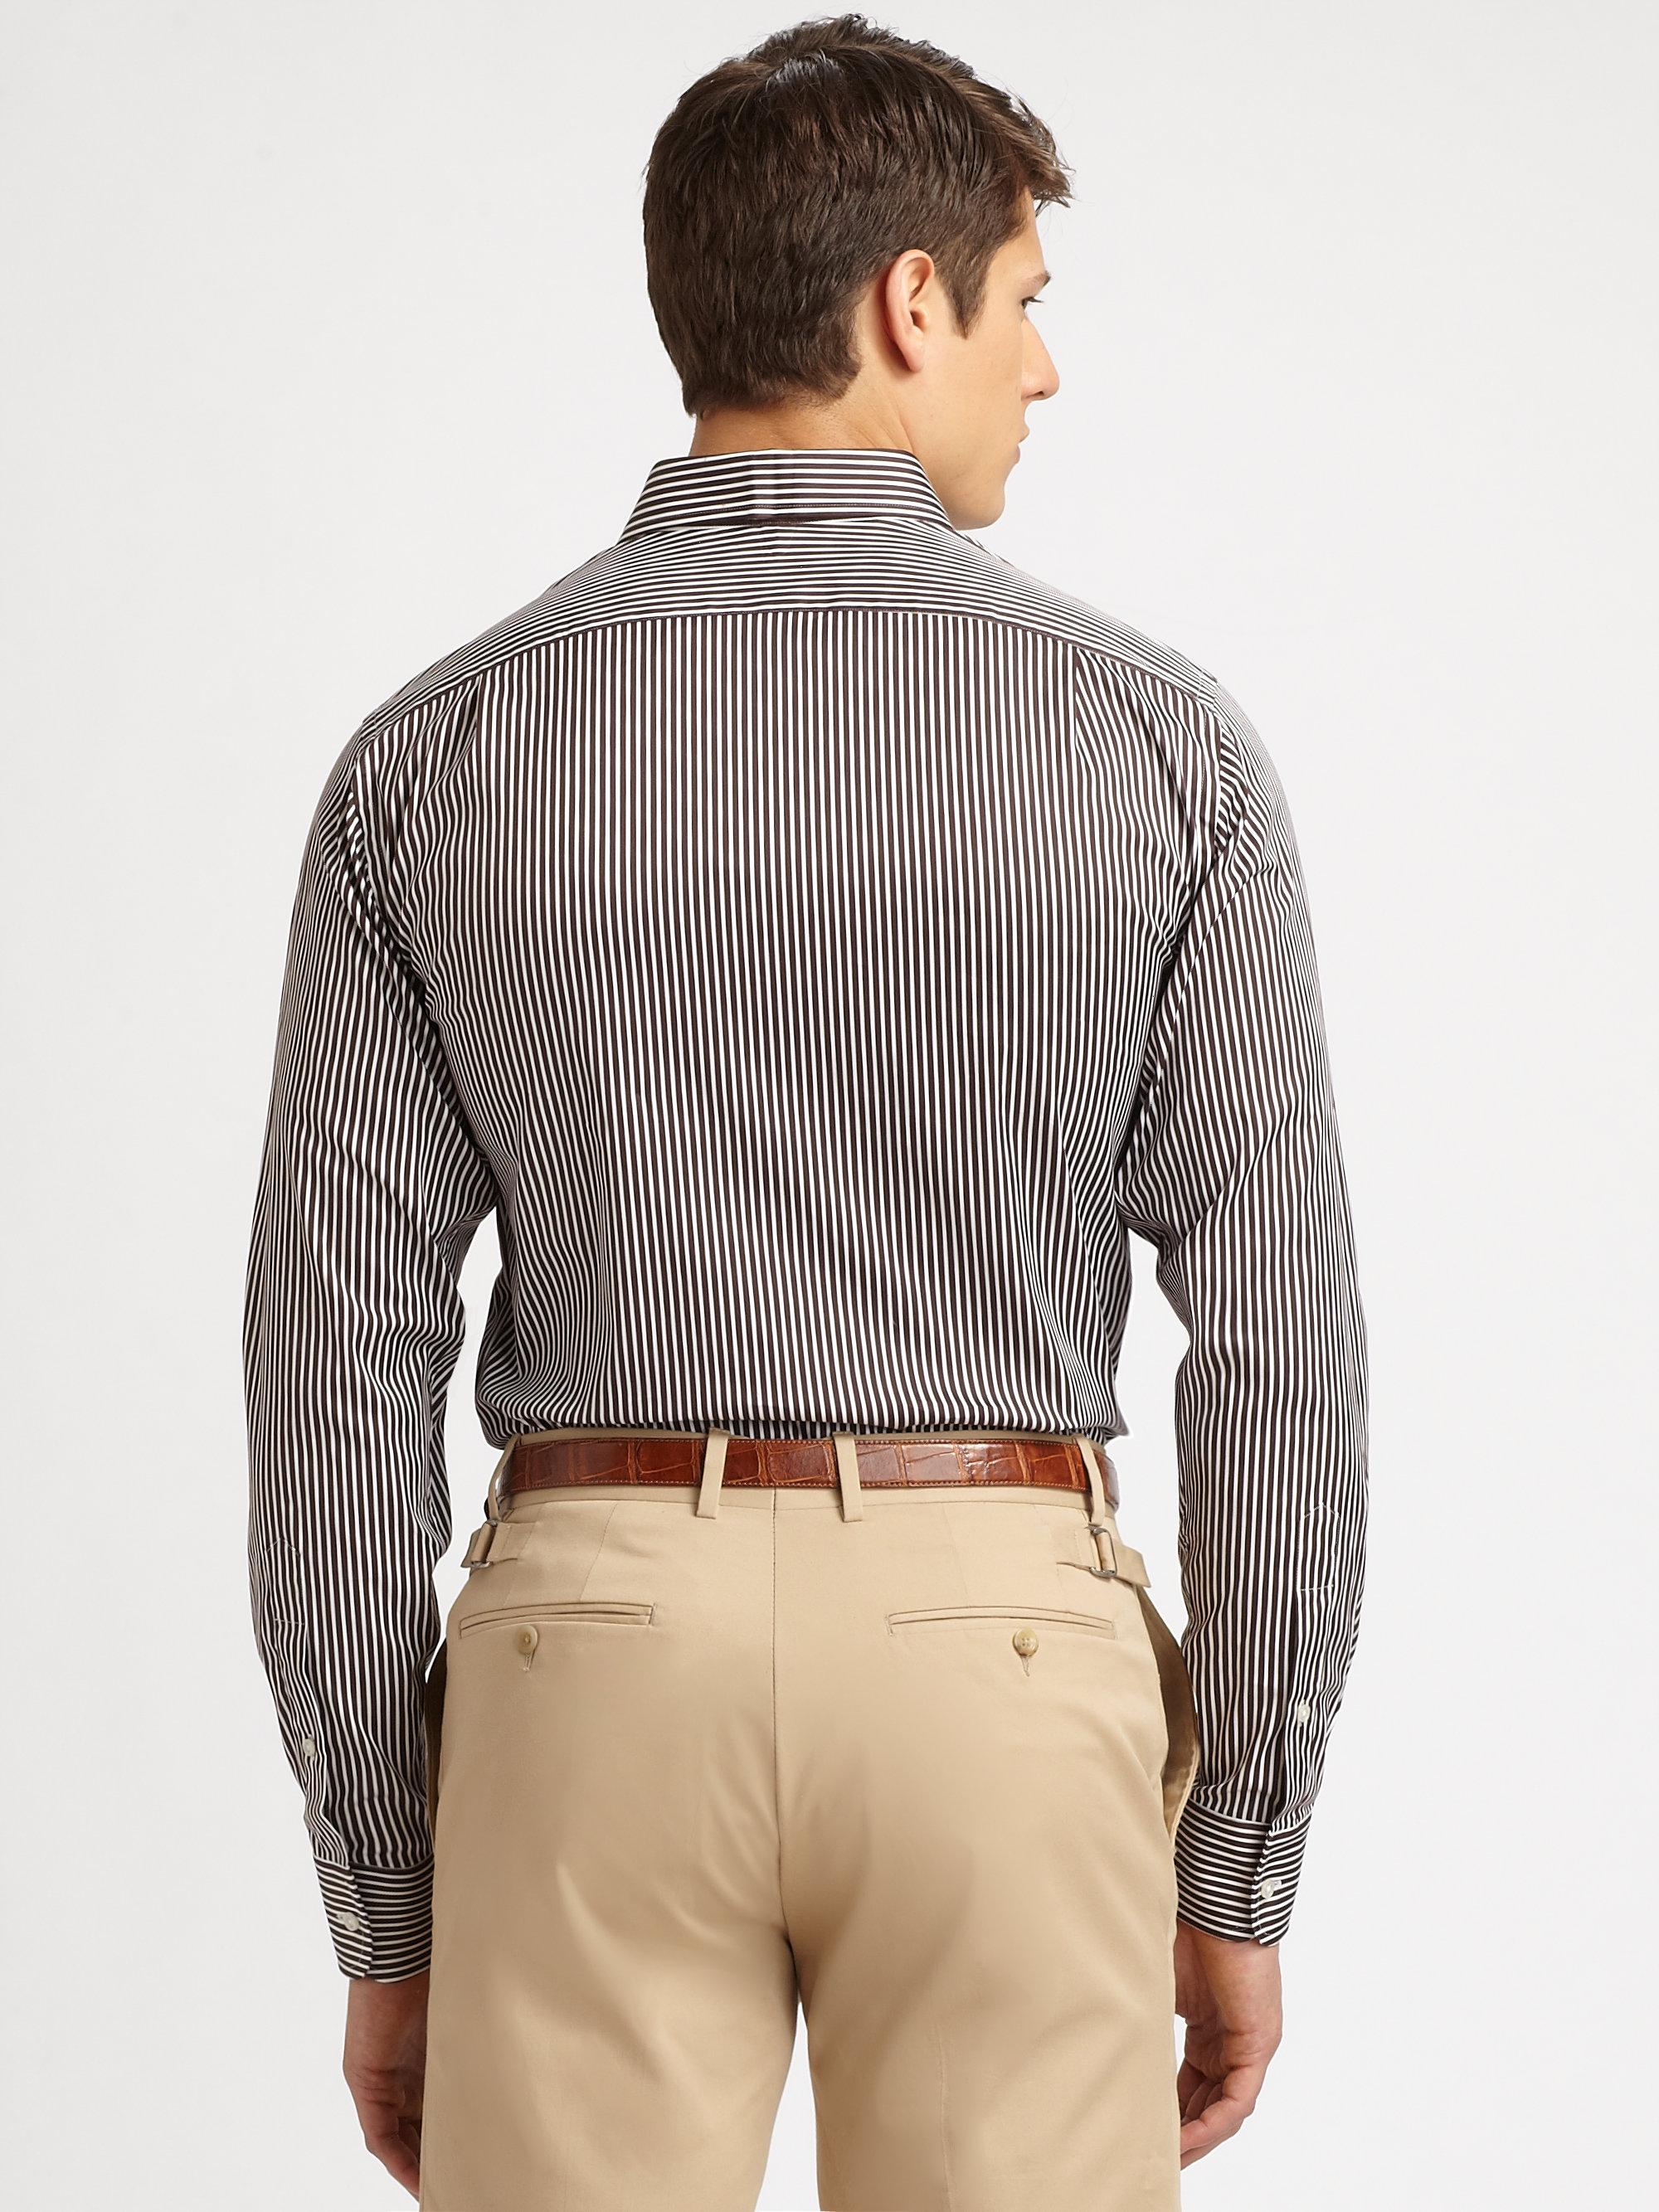 Lyst Ralph Lauren Black Label Striped Dress Shirt In